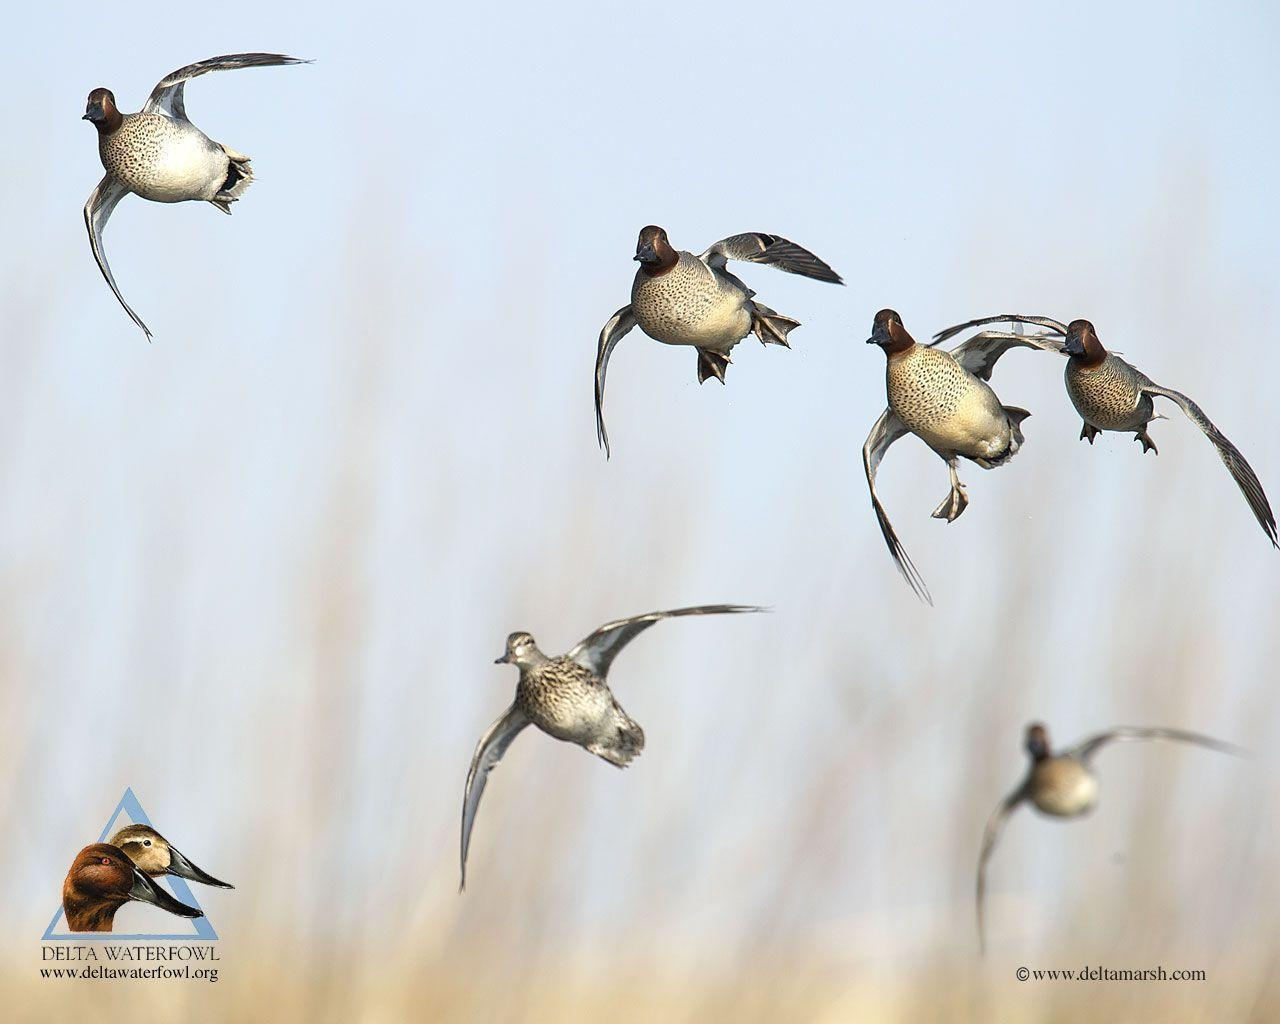 Pix For Delta Waterfowl Wallpaper